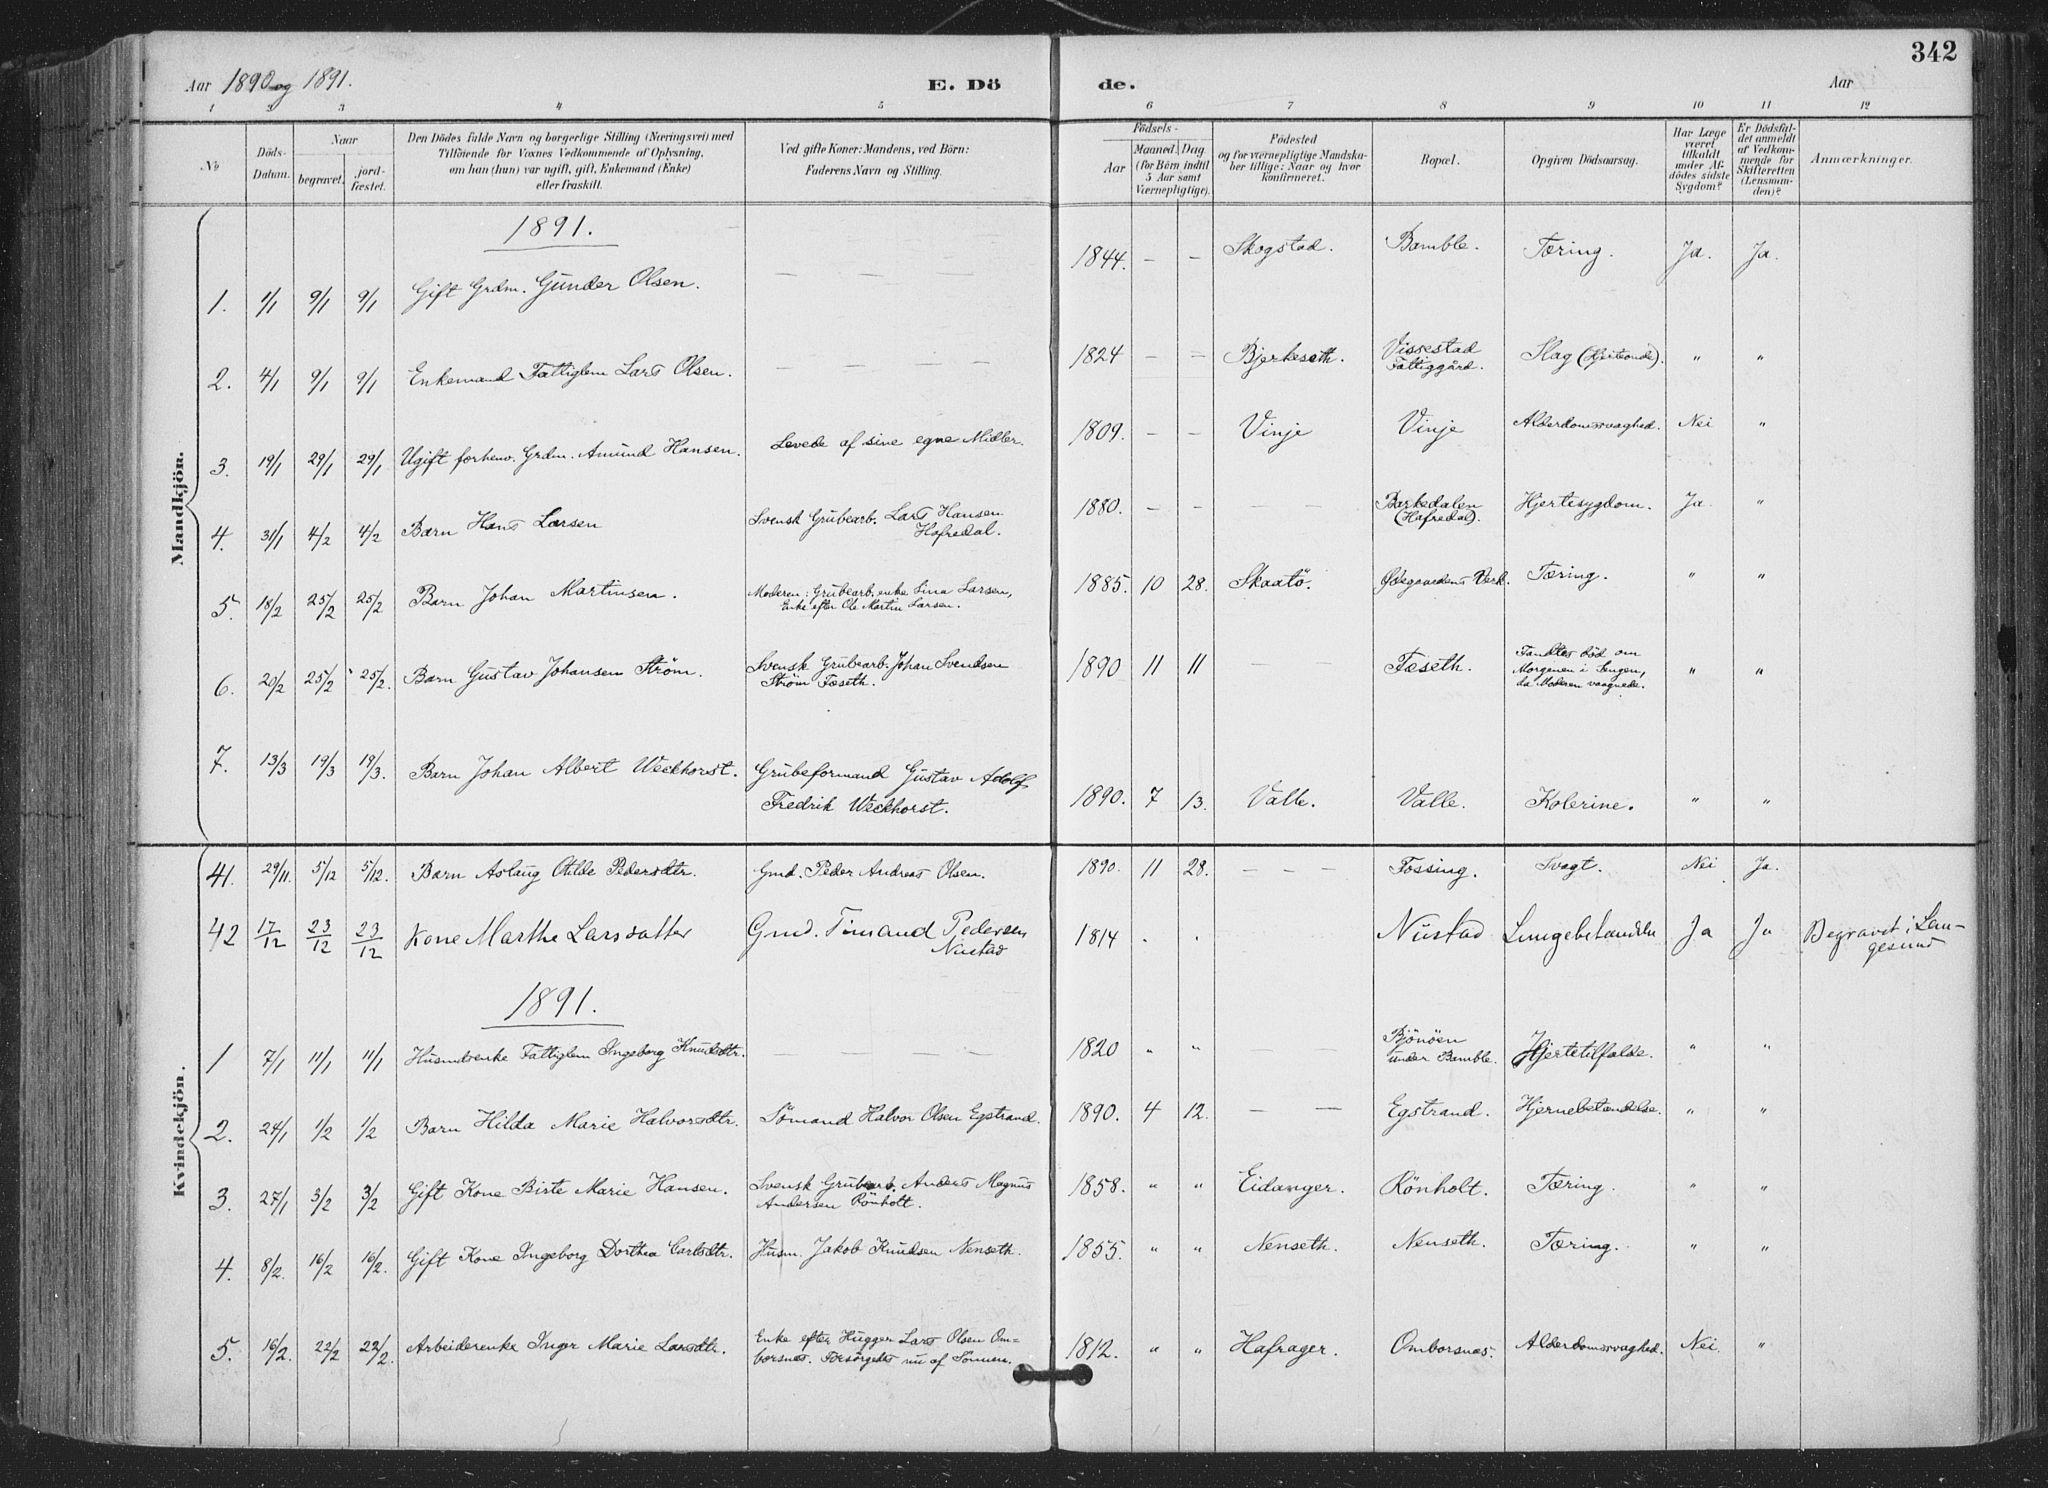 SAKO, Bamble kirkebøker, F/Fa/L0008: Ministerialbok nr. I 8, 1888-1900, s. 342